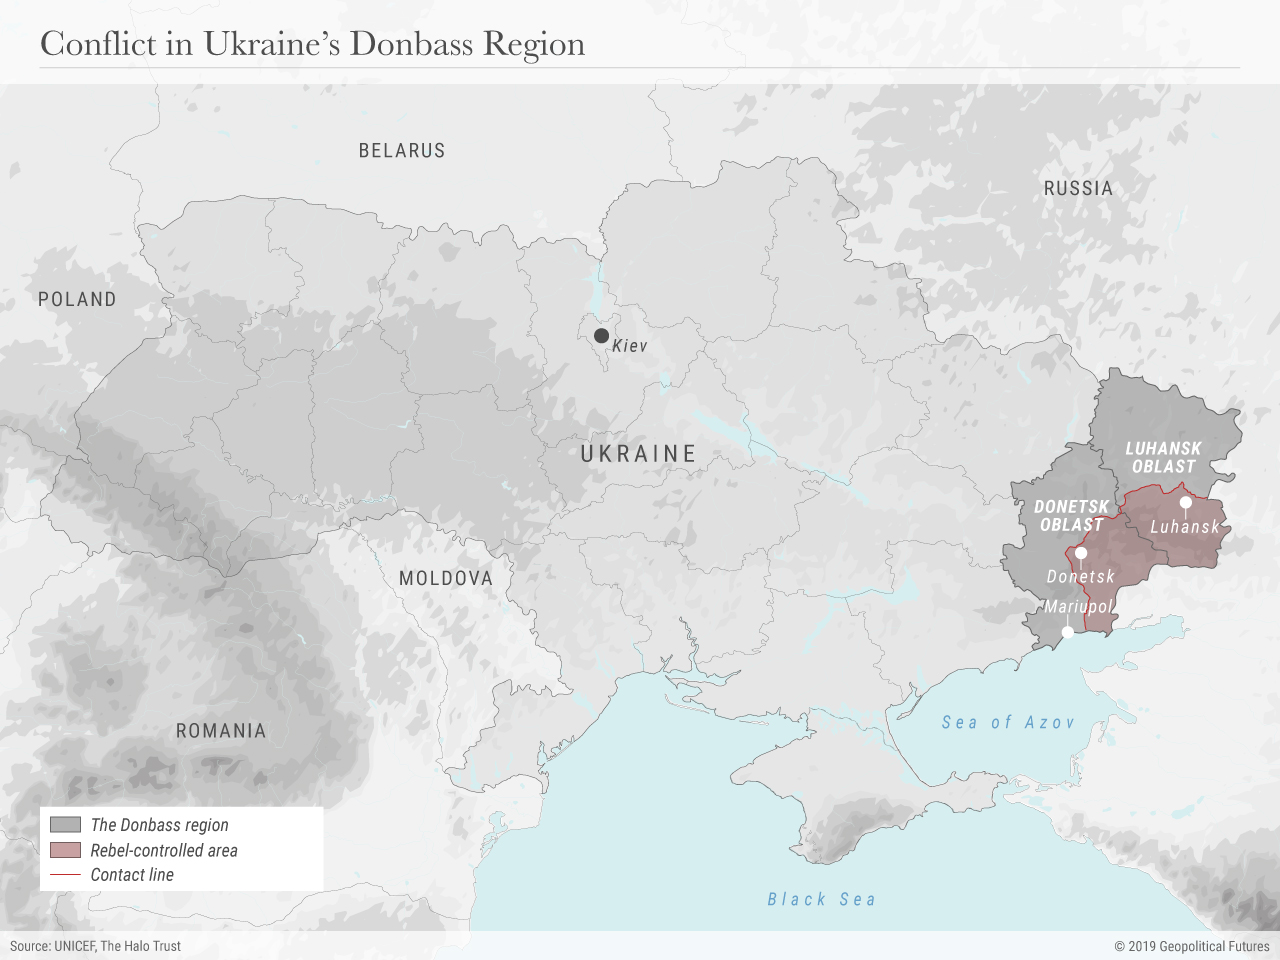 Conflict in Ukraine's Donbass Region